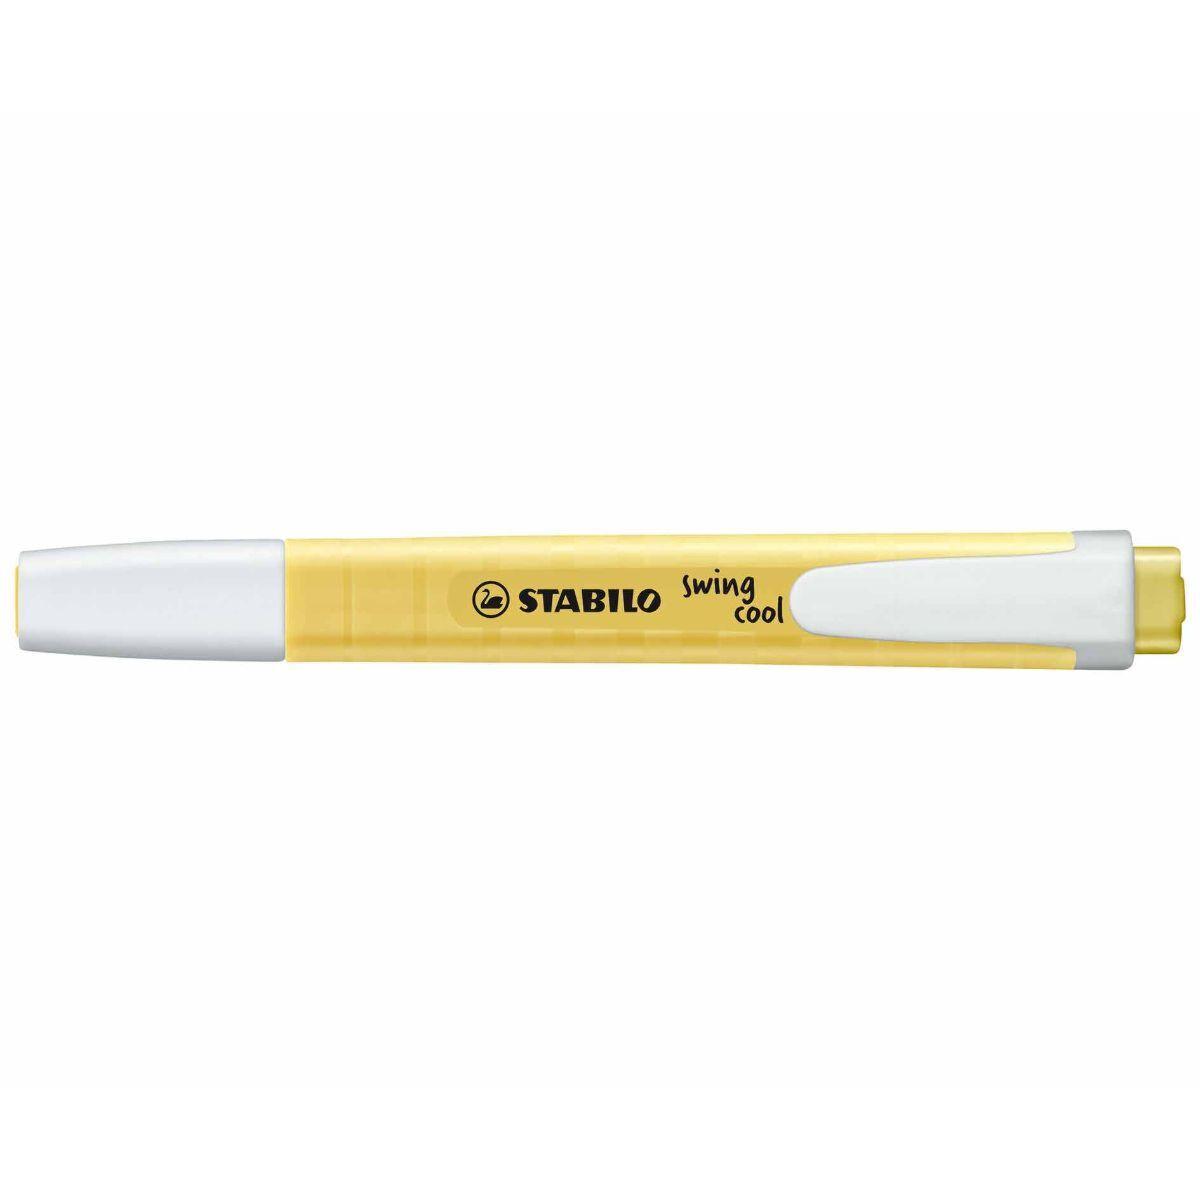 STABILO Swing Cool Pastel Highlighter